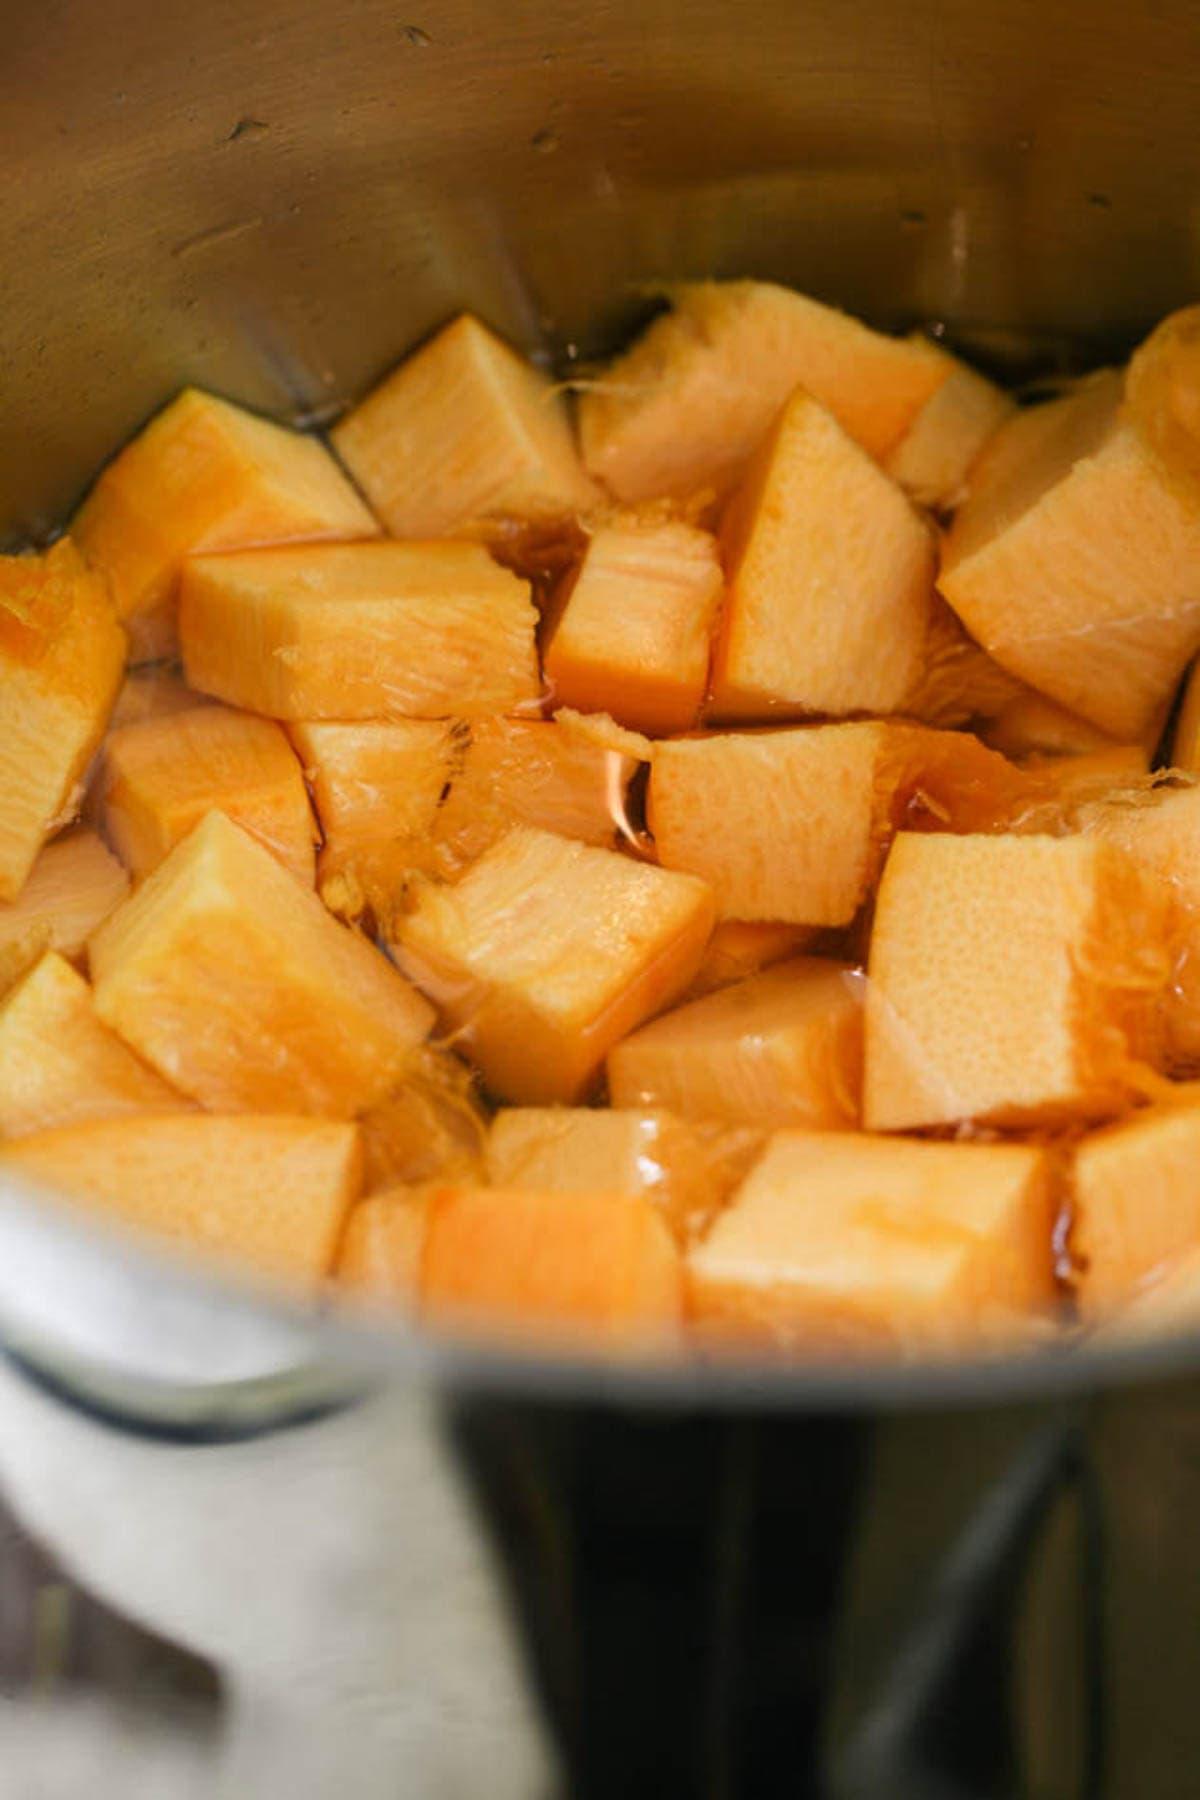 Boiling the pumpkin in water.